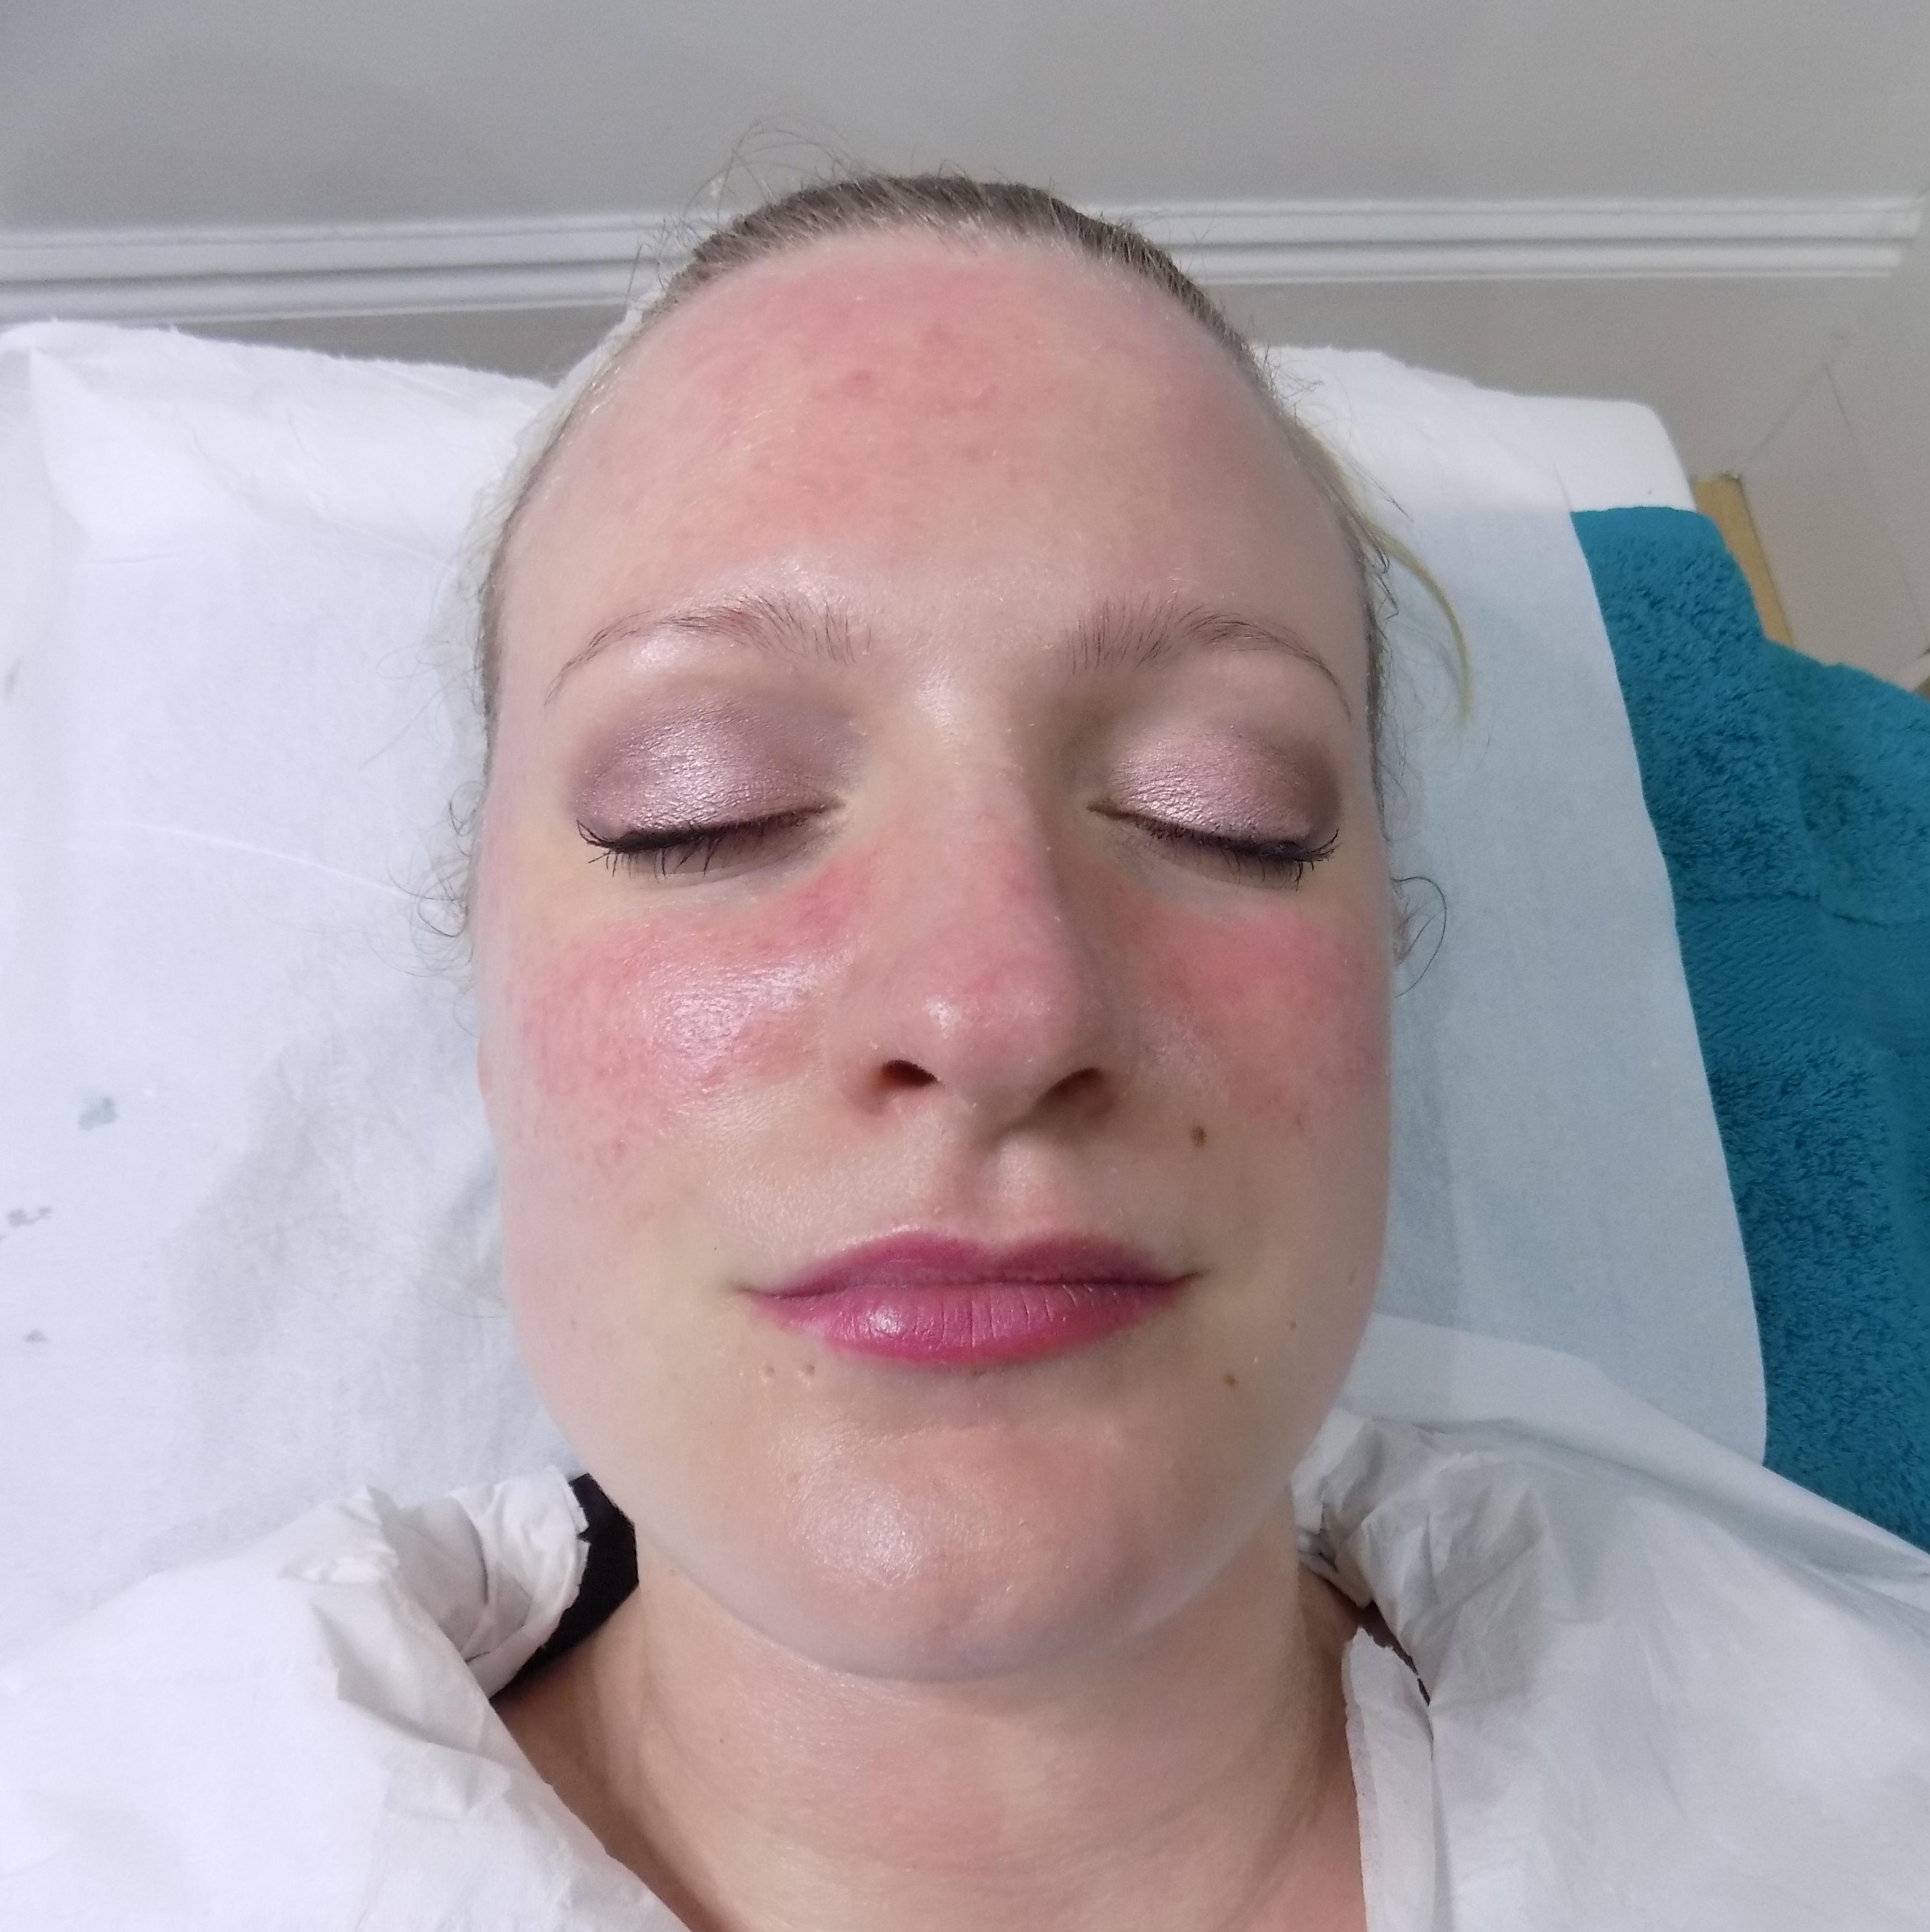 Skinbreeze CACI facial review, rosacea-prone skin - Talonted Lex